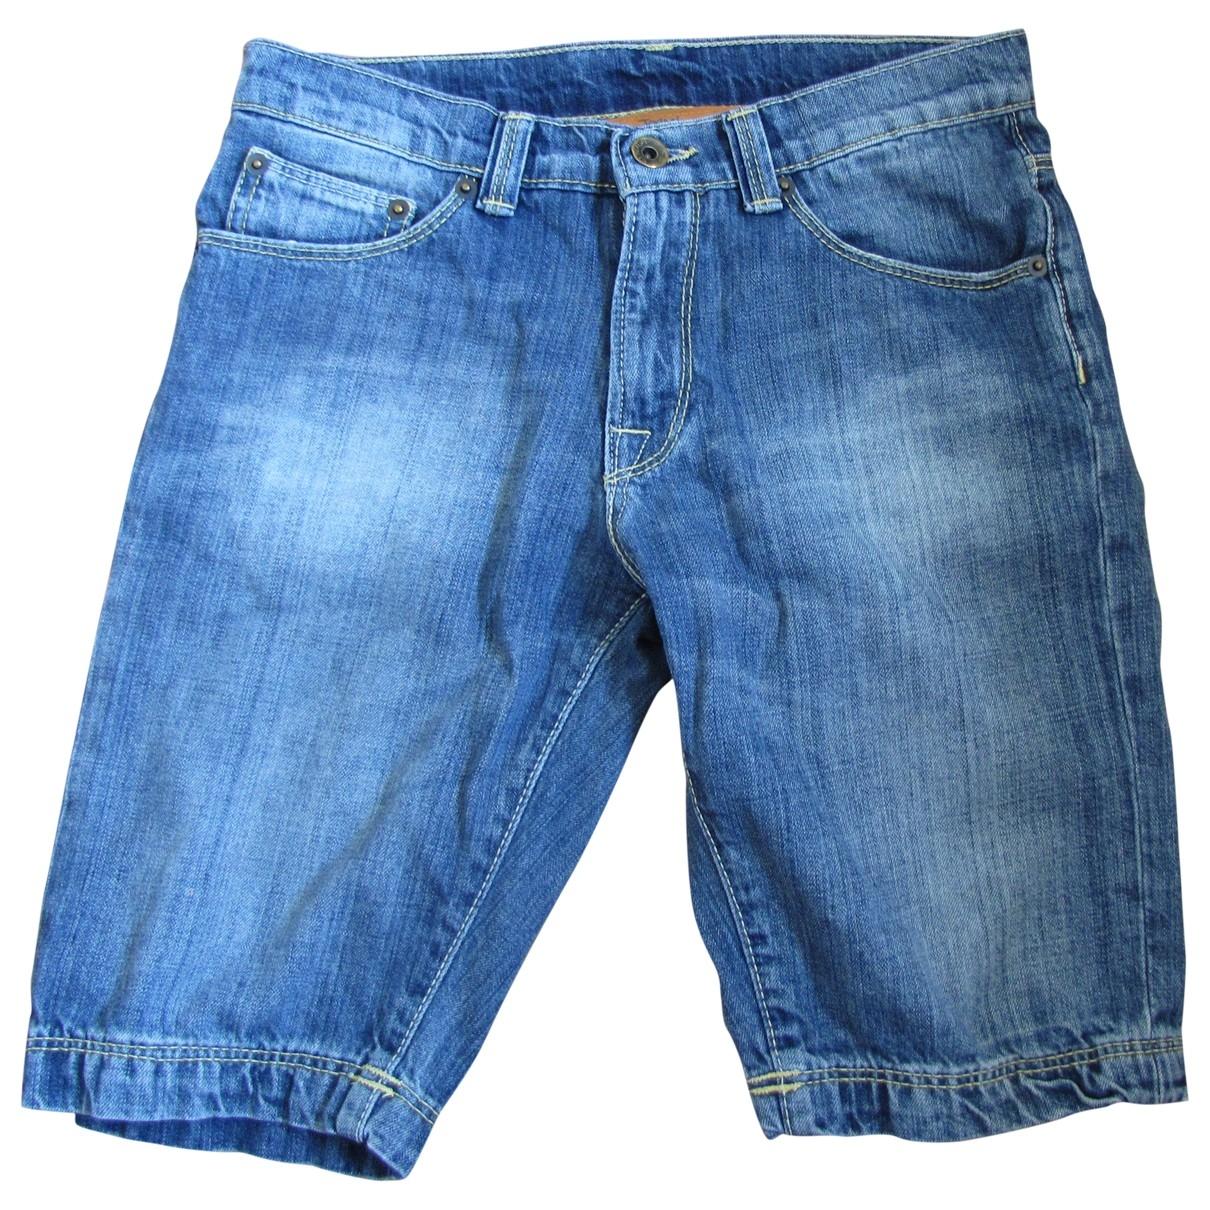 Napapijri \N Blue Cotton Shorts for Kids 14 years - S FR